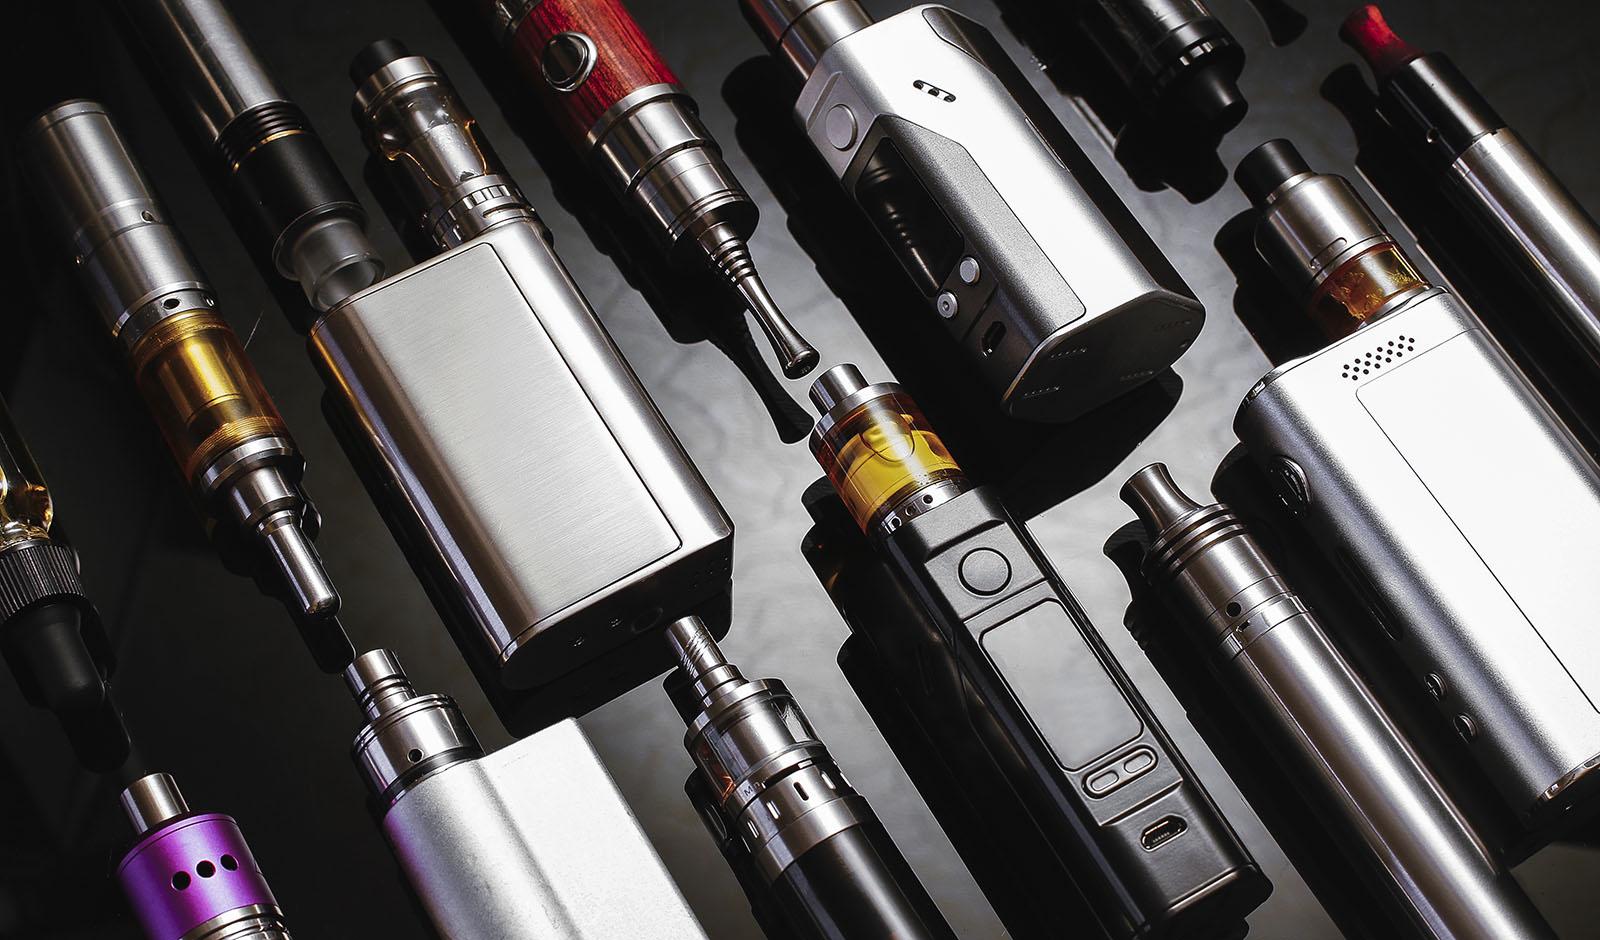 Popular vaping device mod.Upgrade parts for modern vaporizer e-c